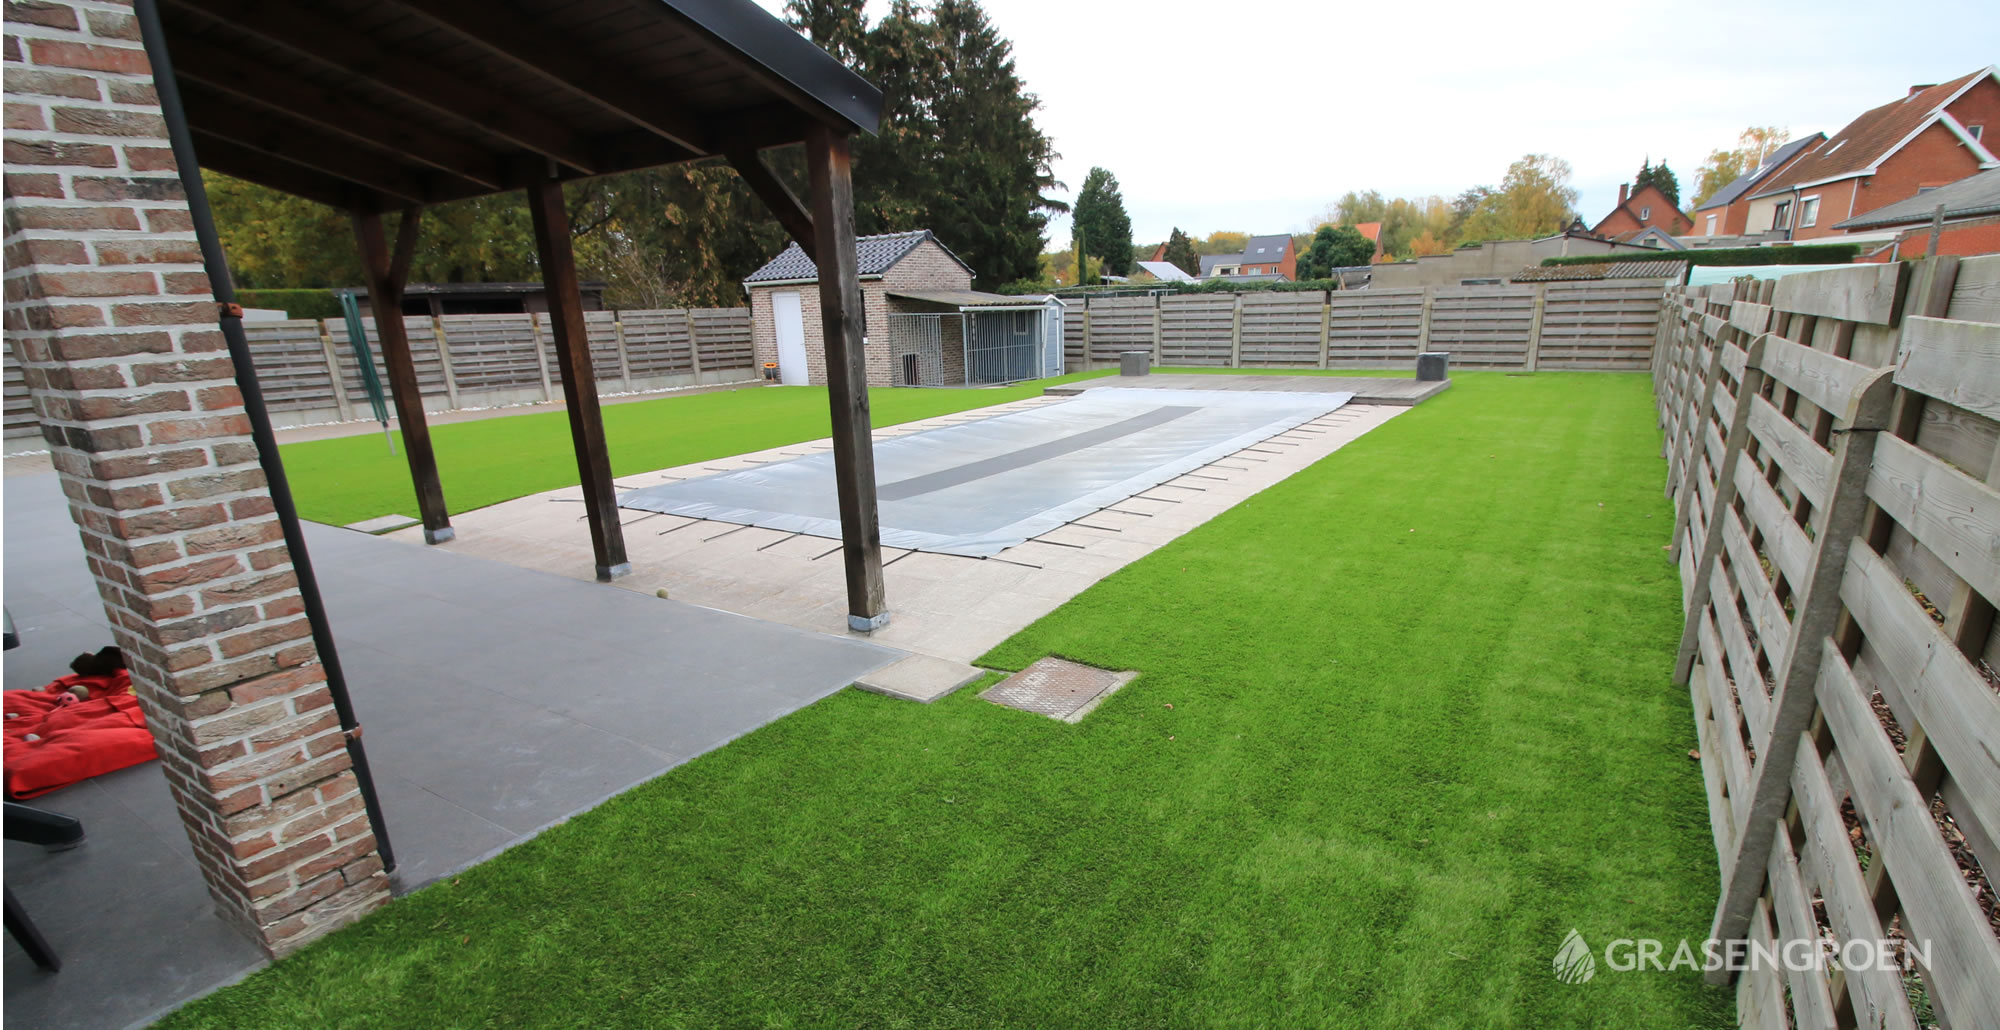 Kunstgrasleggenzelem17 • Gras en Groen Kunstgras